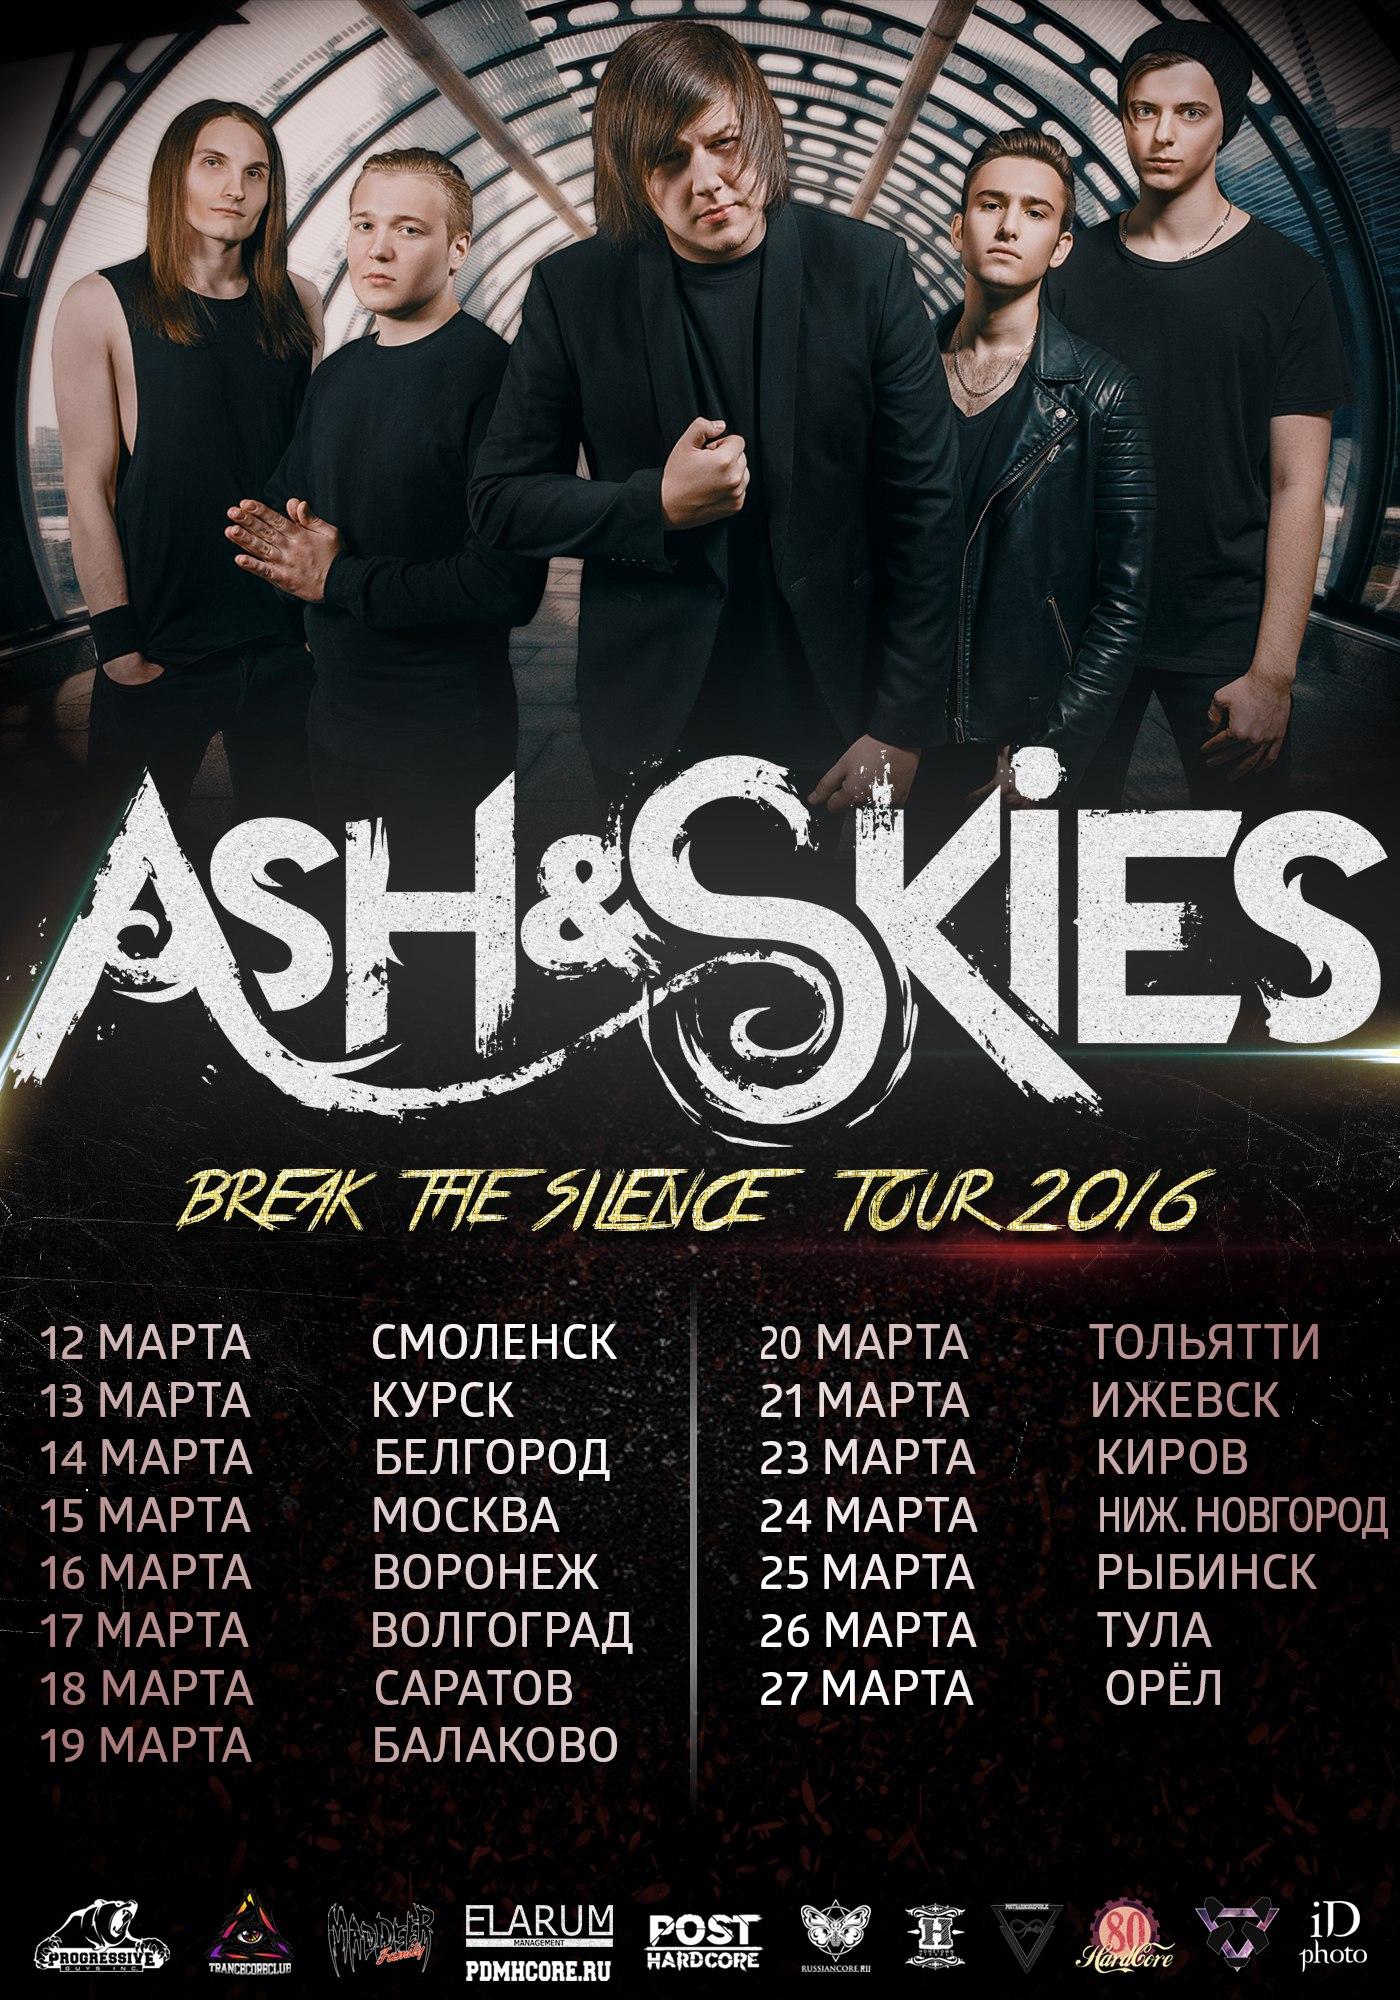 Ash & Skies тур Россия 2016